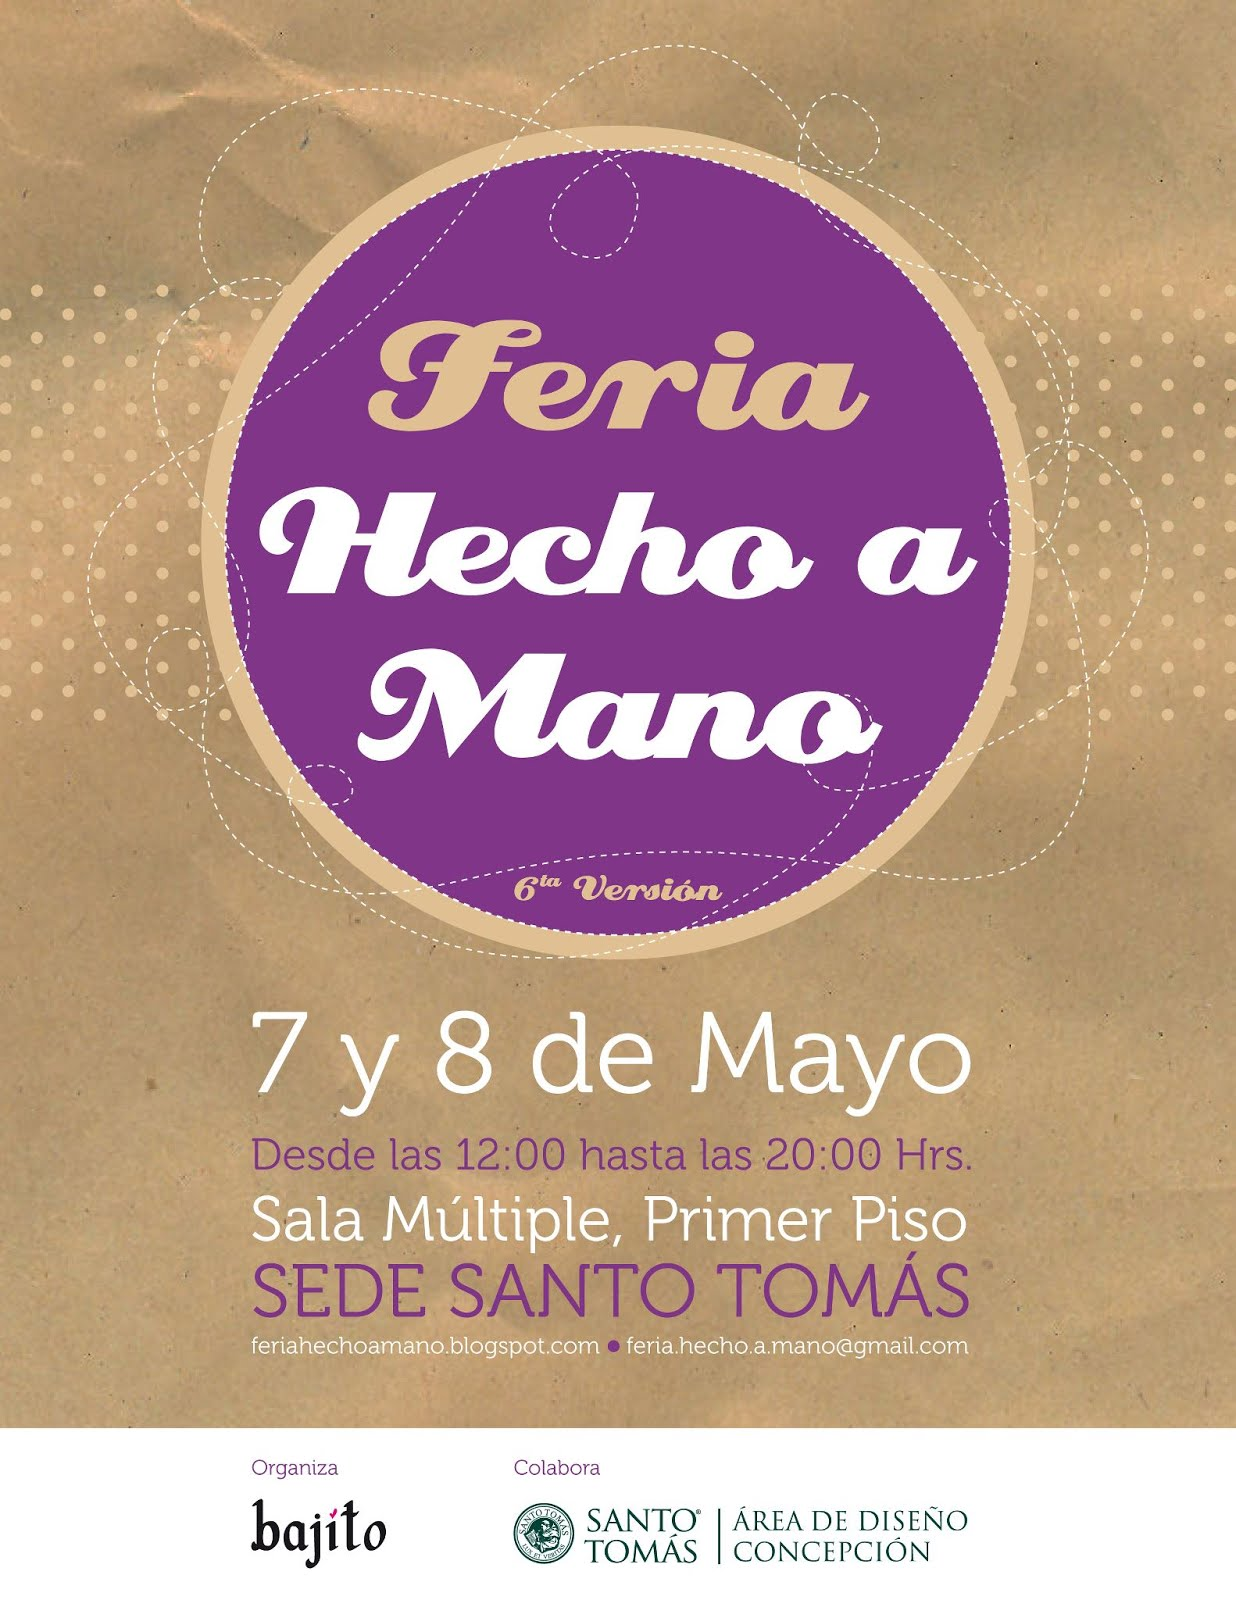 FERIA HECHO A MANO   2012